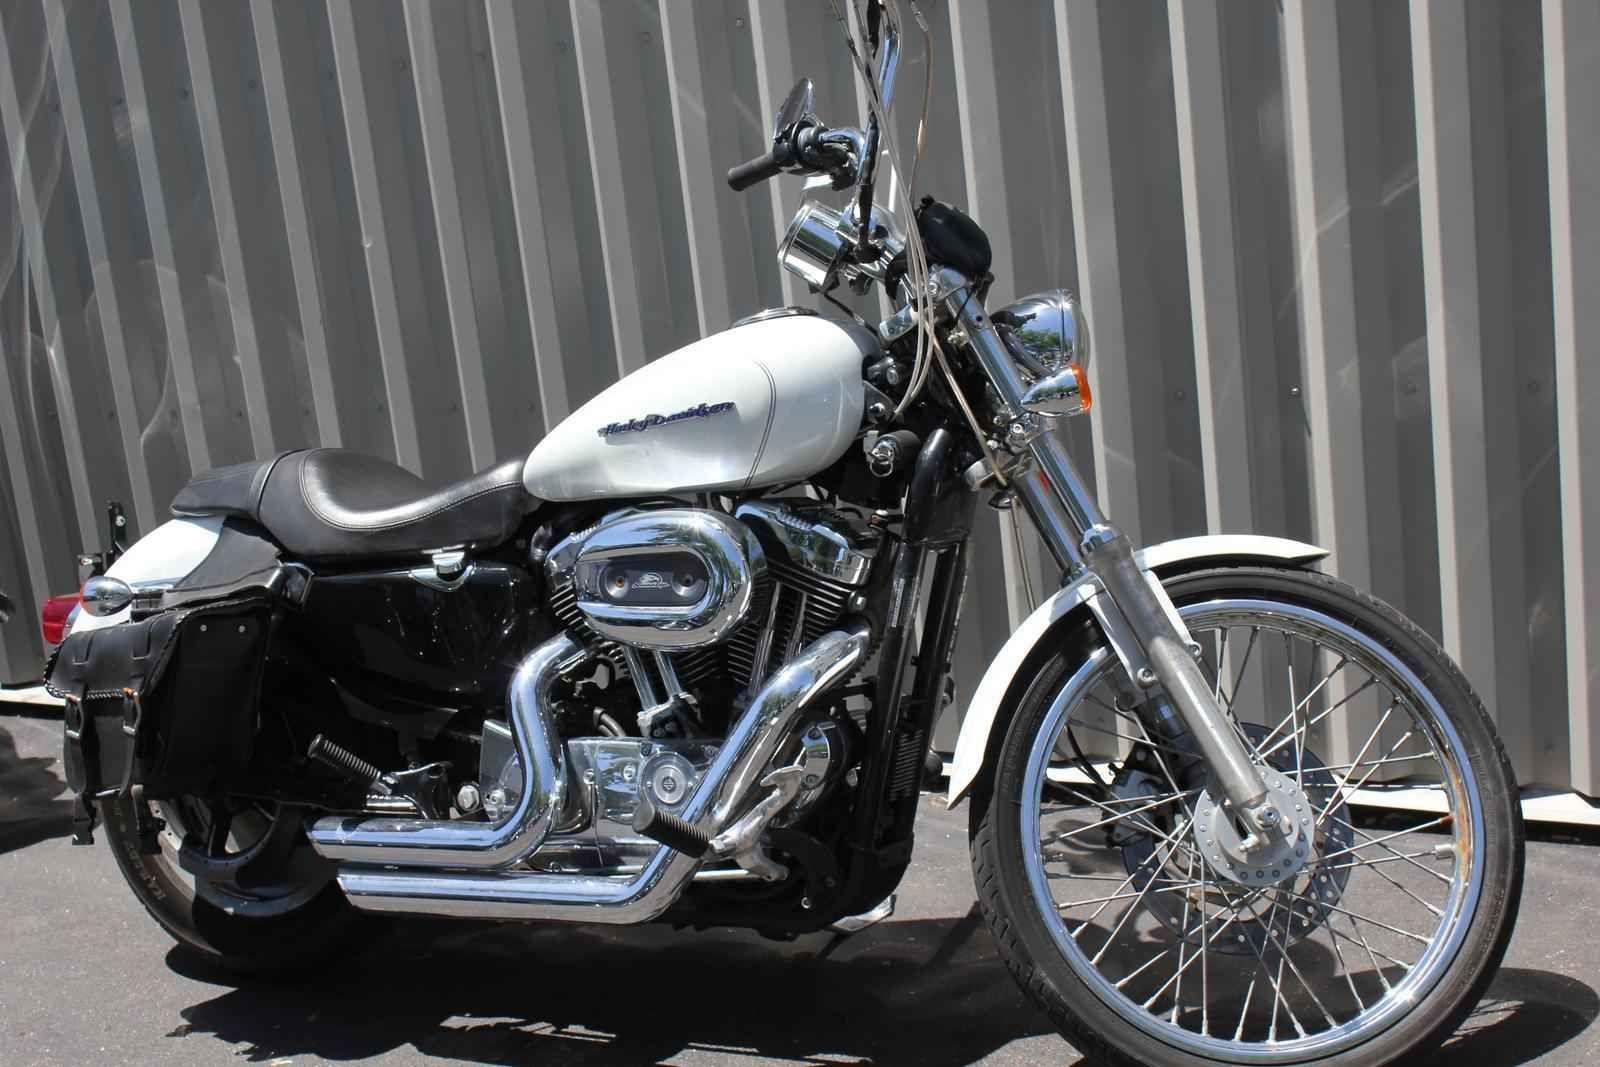 Used 2005 HarleyDavidson XL1200C Sportster Custom Ref